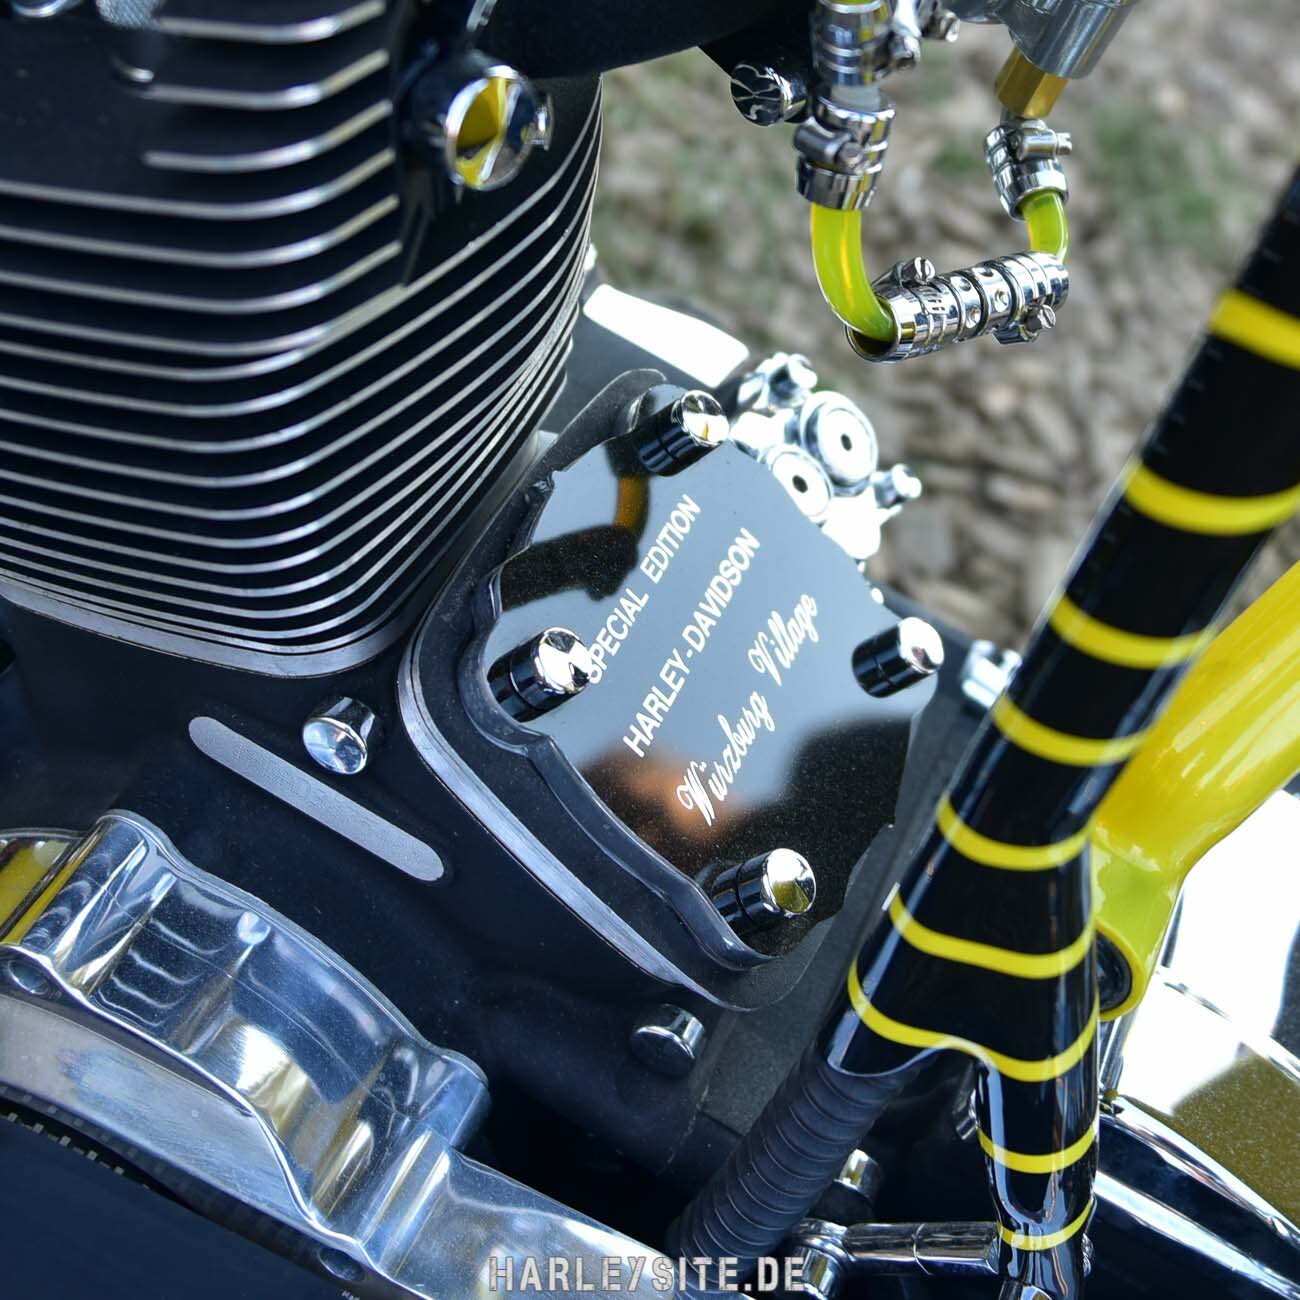 European-Bike-Week-0958